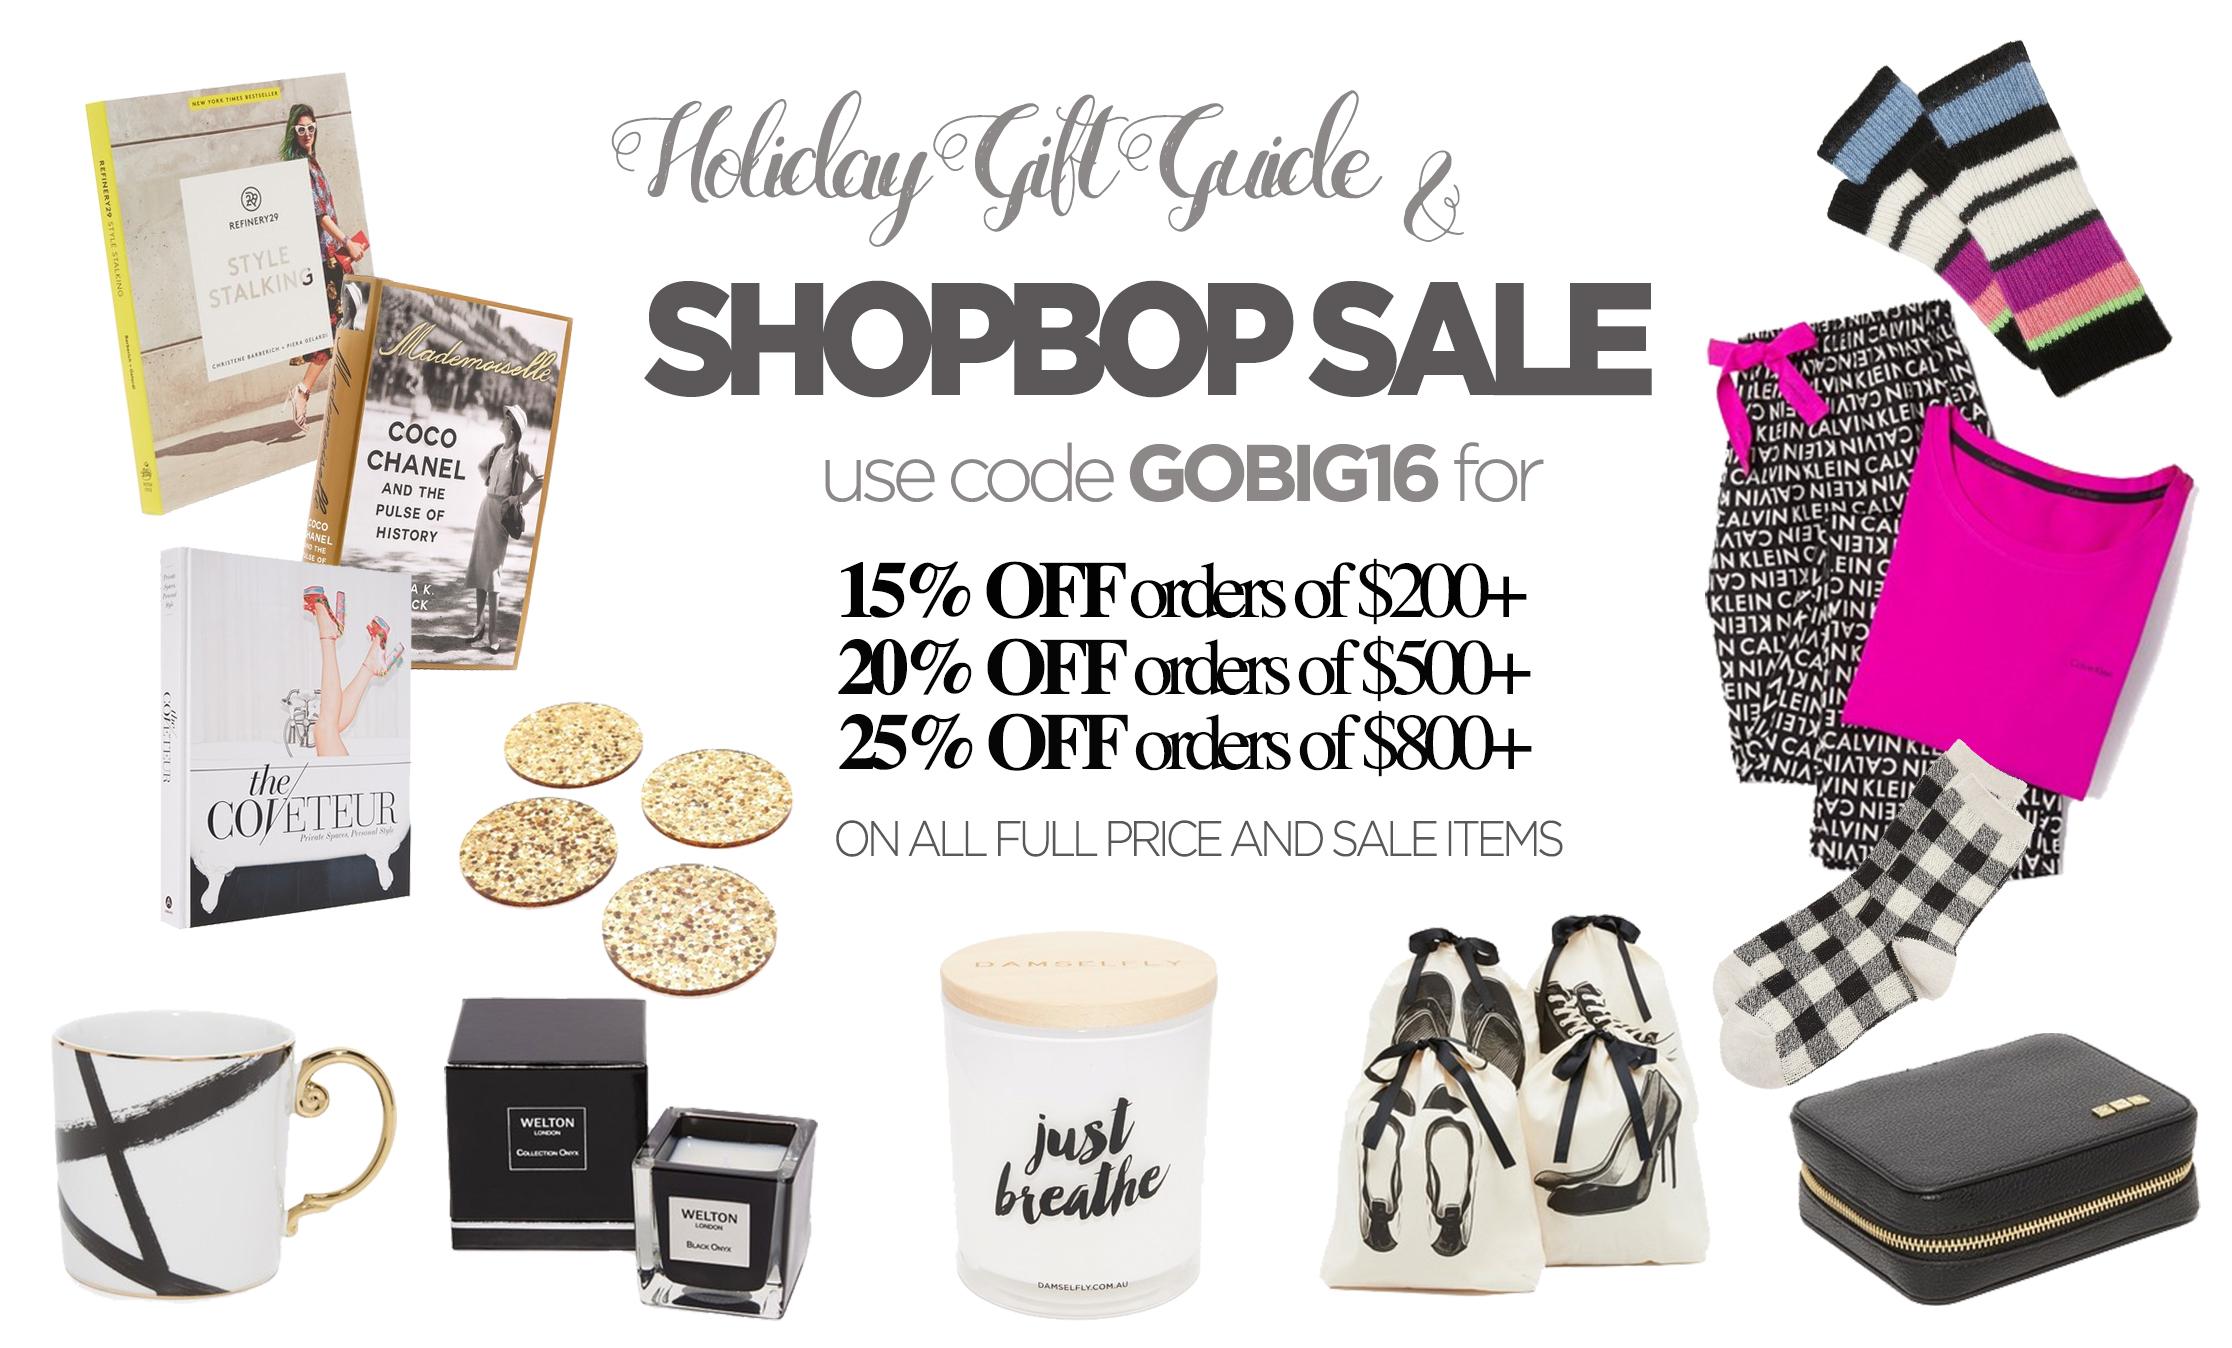 cf254a4a2d3ae Holiday gift guide   Shopbop sale! - Samantha Mariko